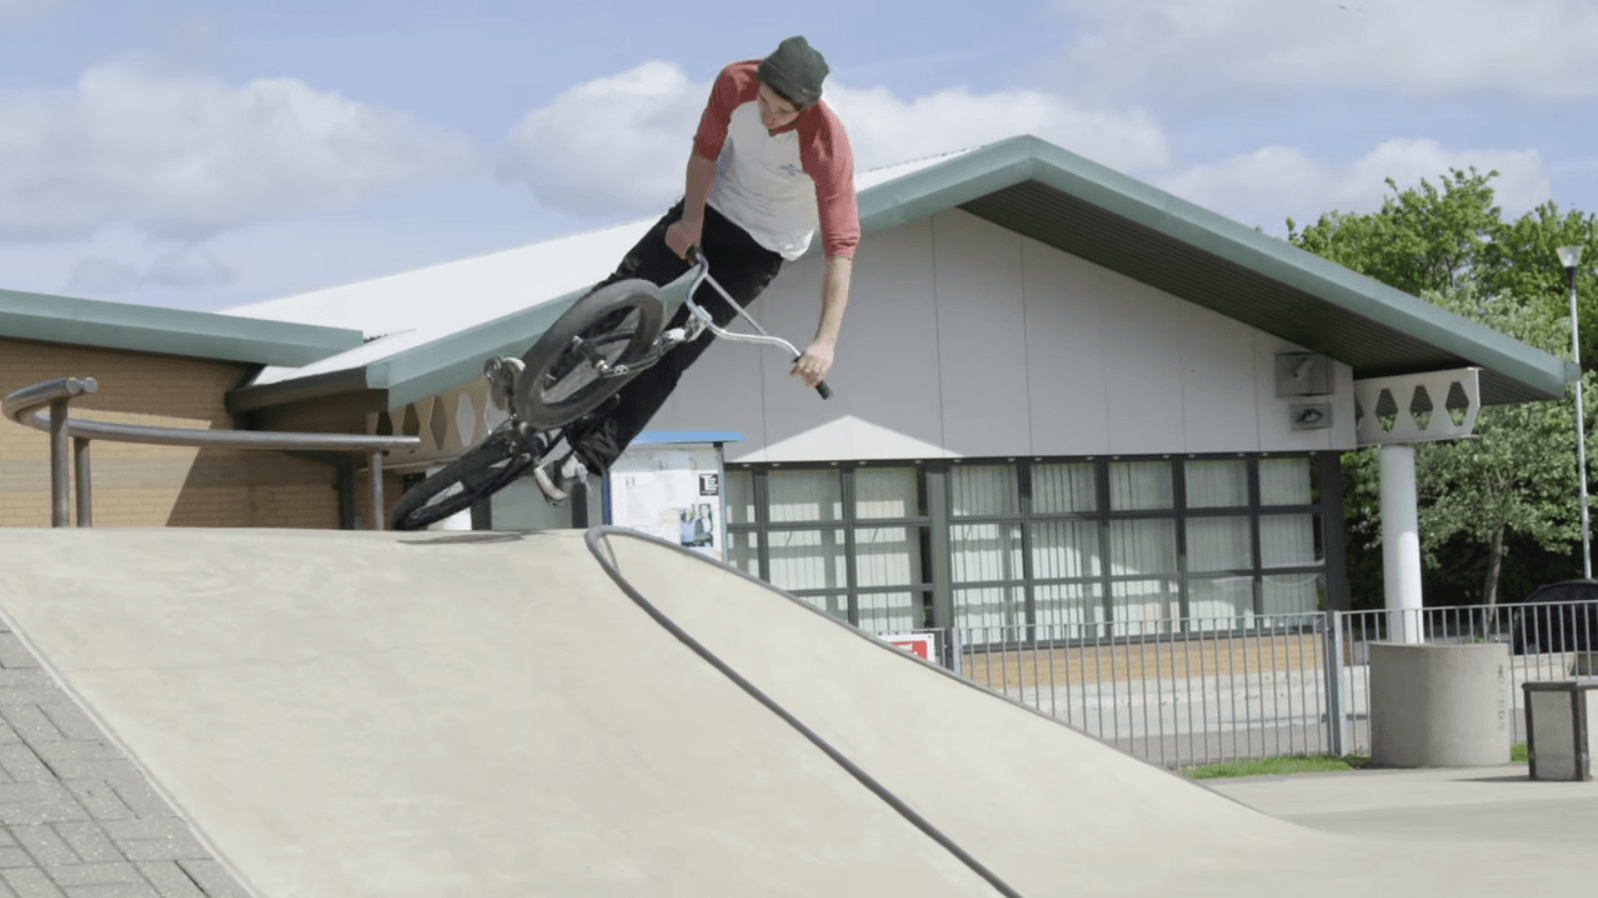 Villa Road: Andrew 'Inch' Thomson Surfing The Chalk